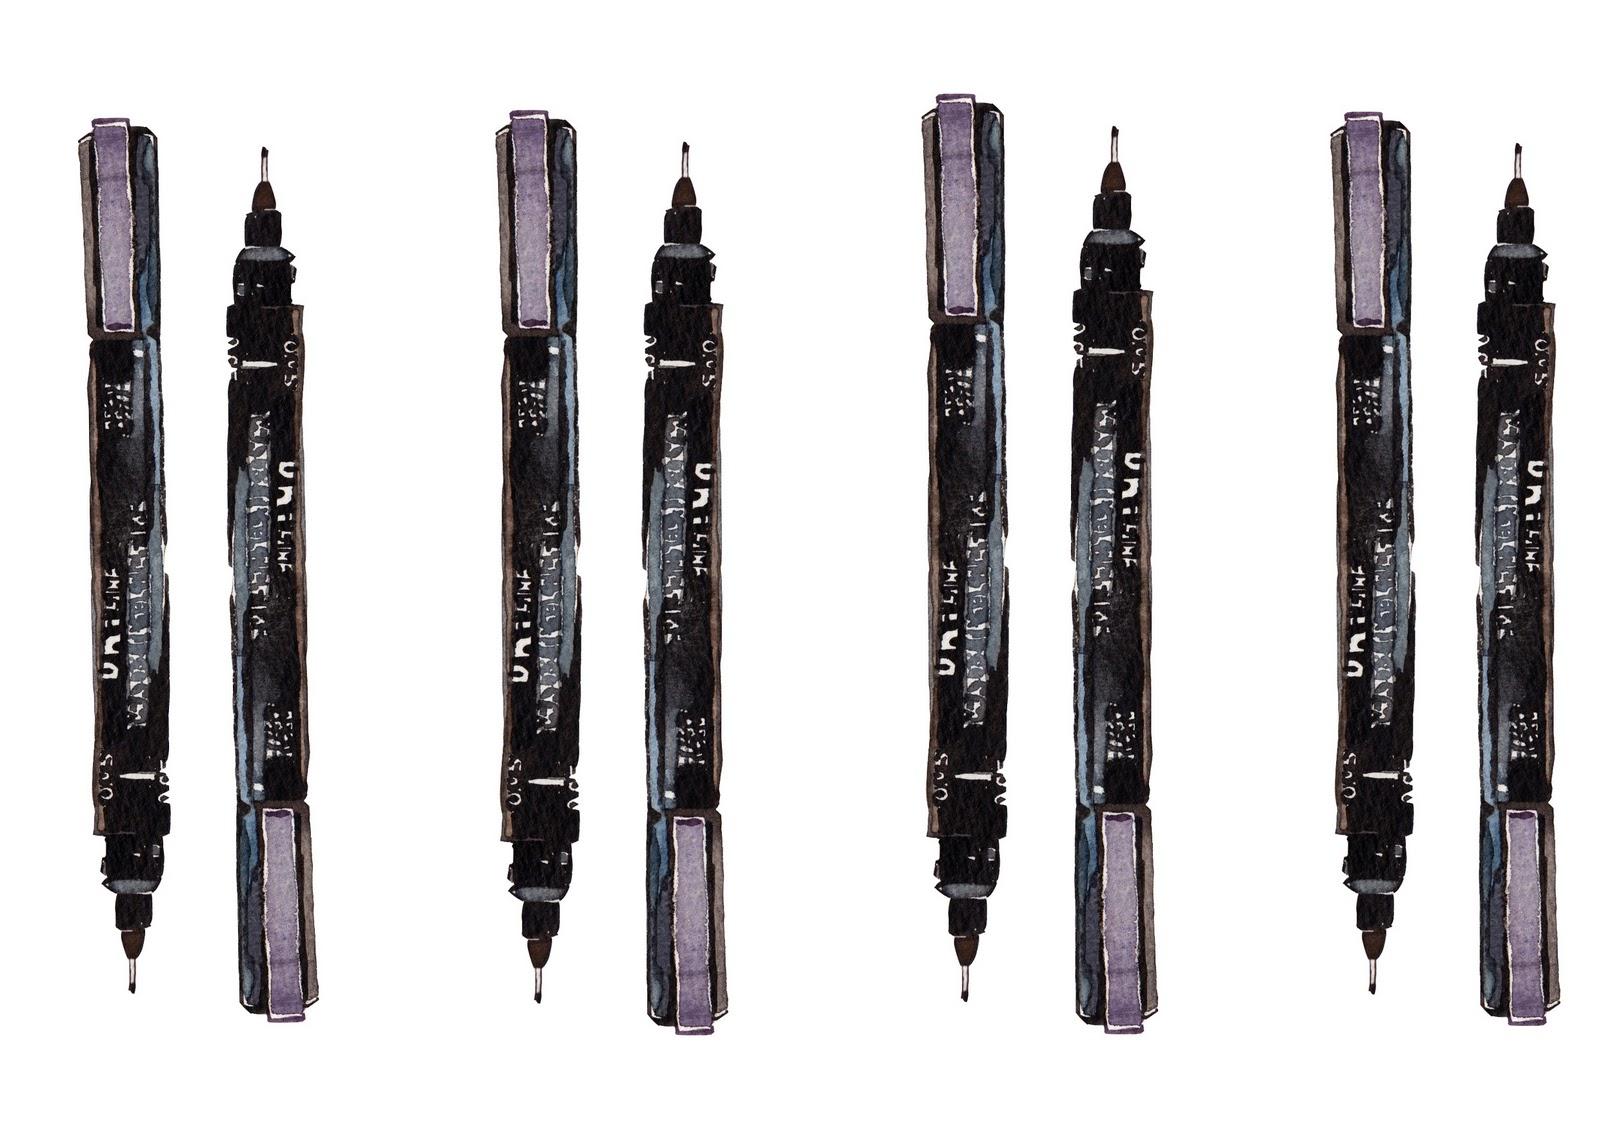 http://4.bp.blogspot.com/-w0zOxPJobyo/TxImUcAQP5I/AAAAAAAABLM/uBe6ausED70/s1600/watercolour-illustration-pens-stationary-fineliner.jpg